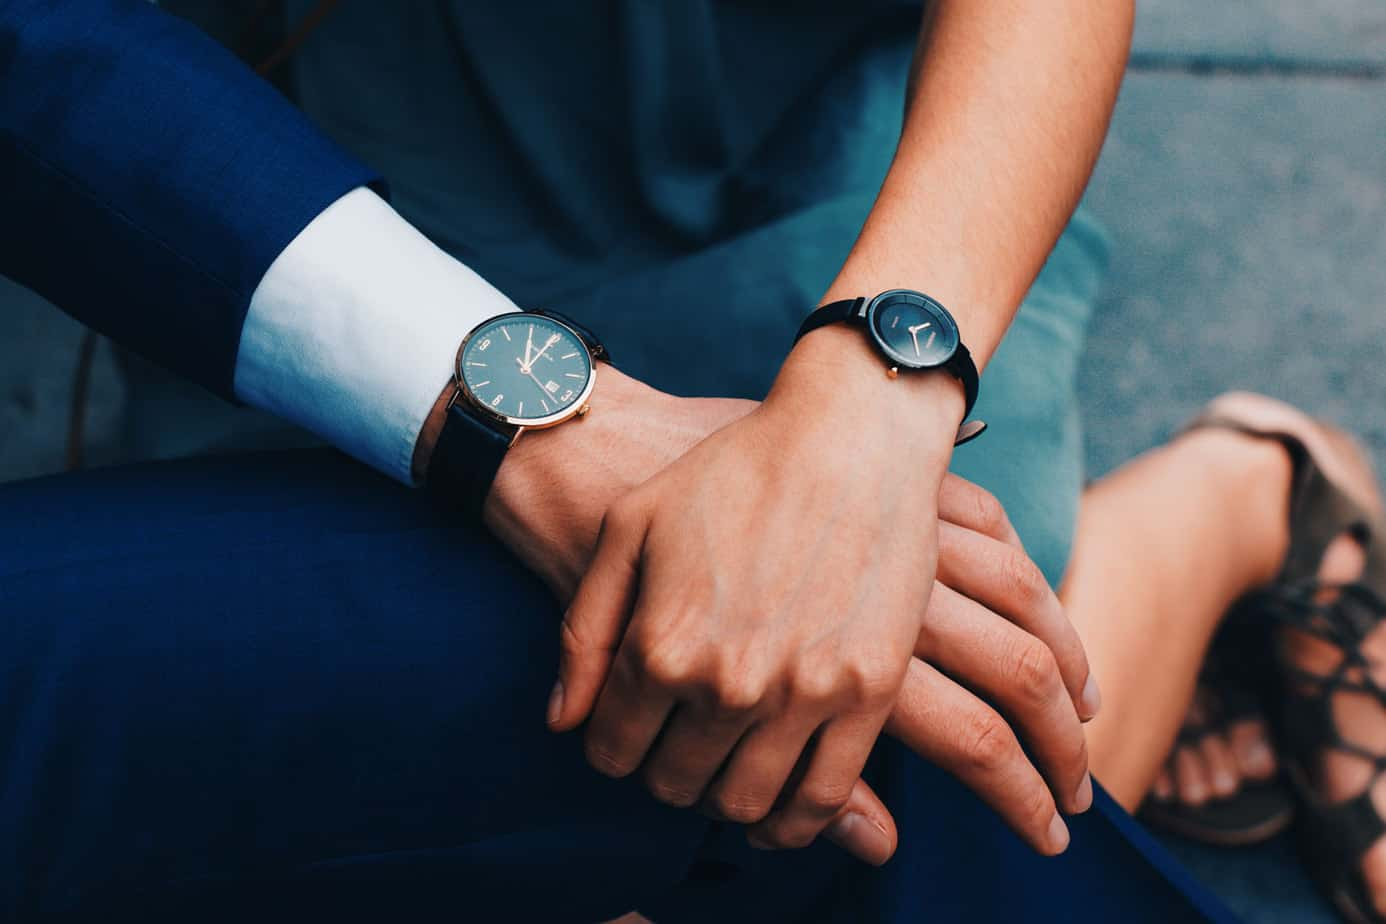 prisma horloges prisma watches kwaliteitshorloges quality watches